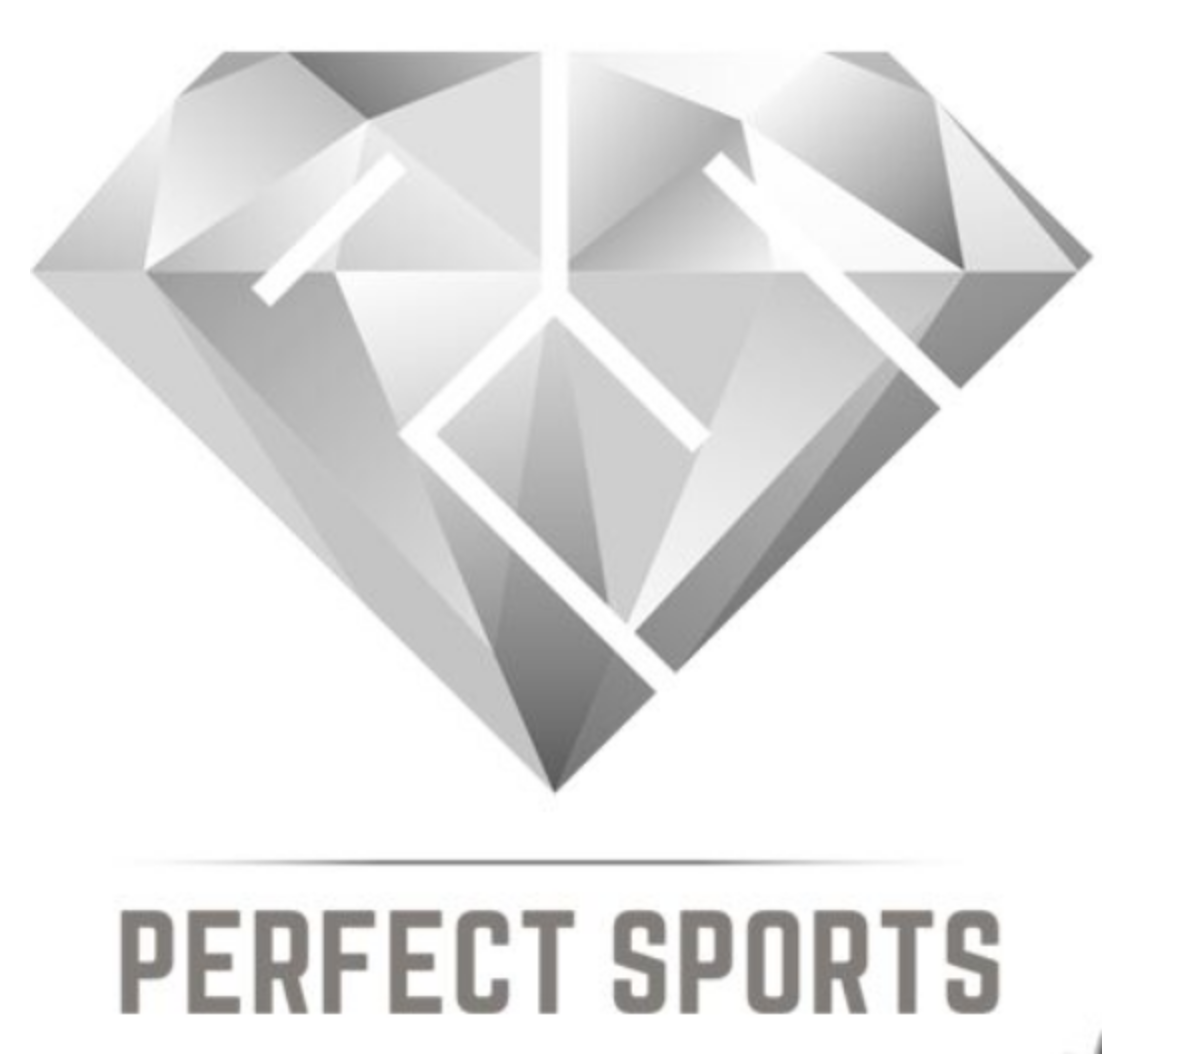 Perfect Sports